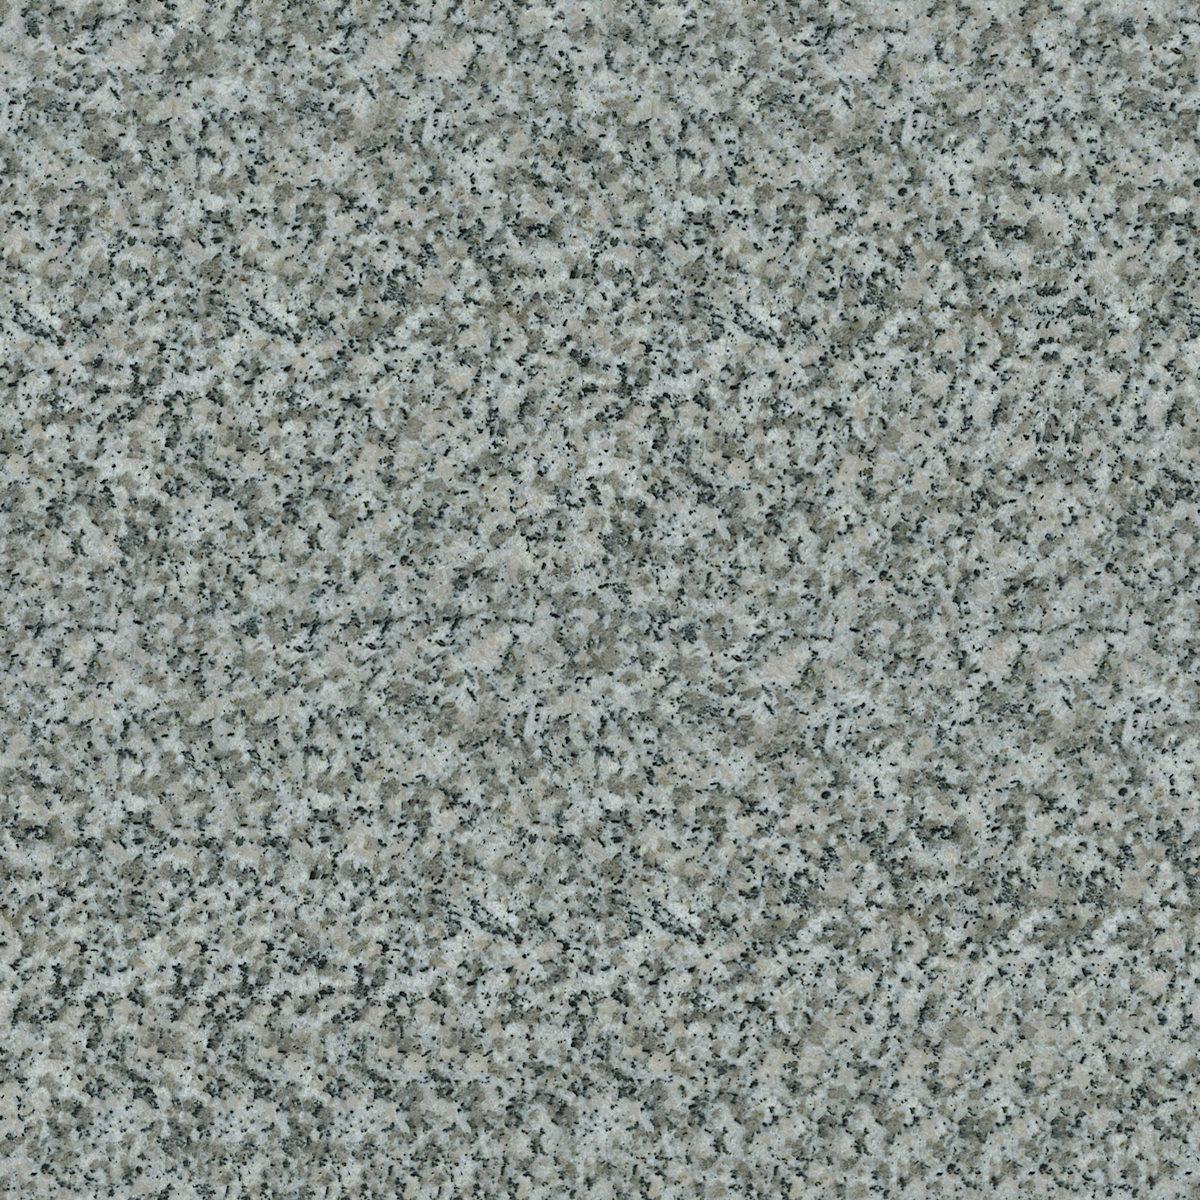 Swtexture Free Architectural Textures White Gray